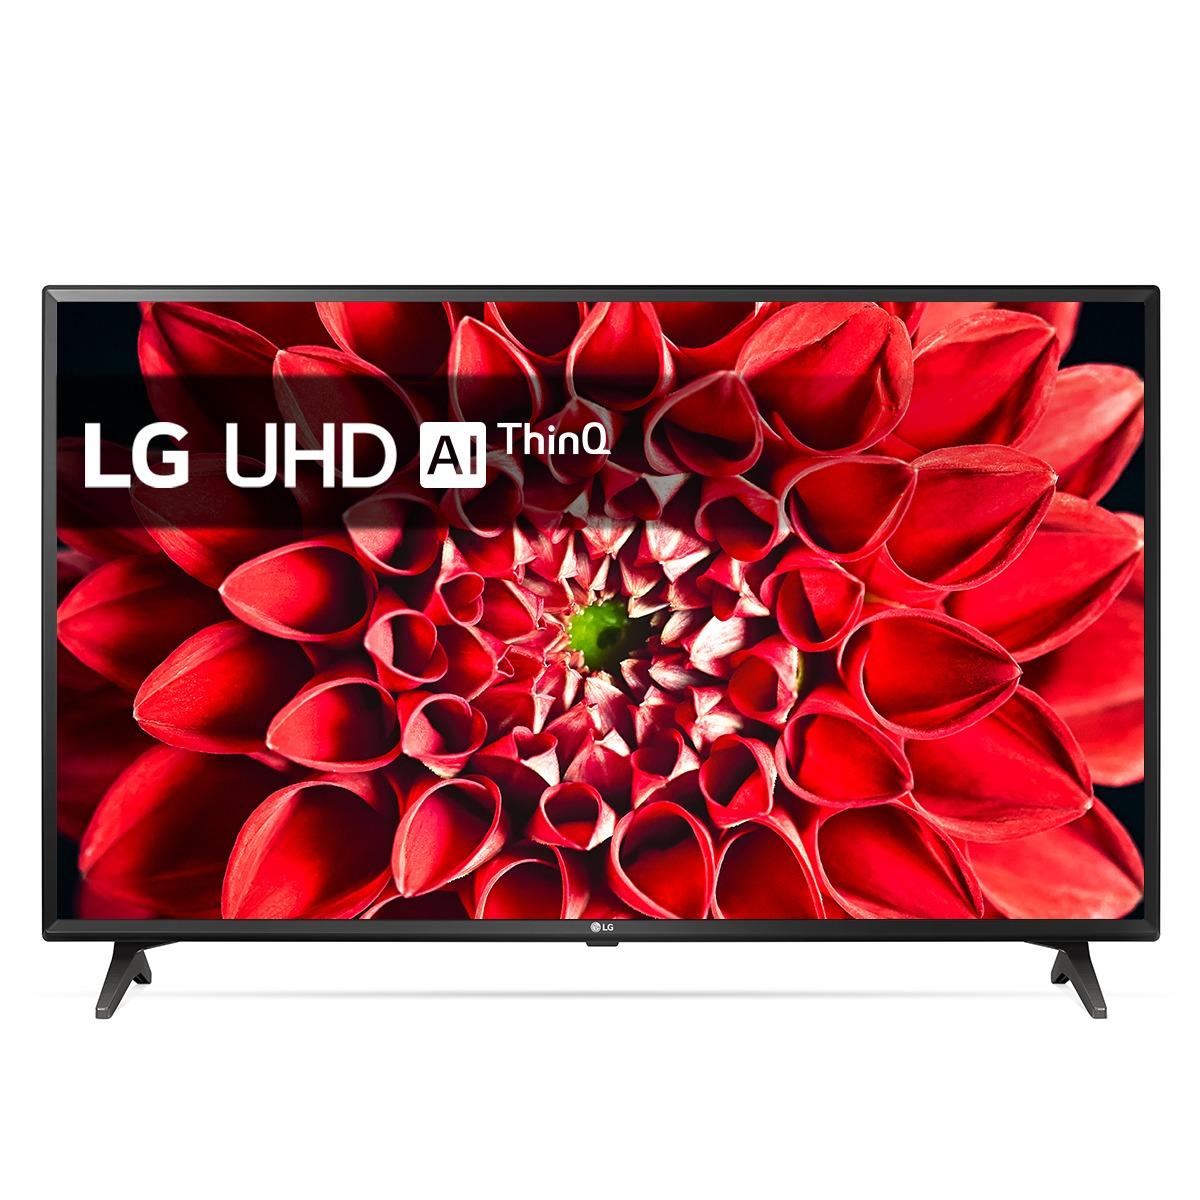 LG 55UM7050 55 inch UHD TV